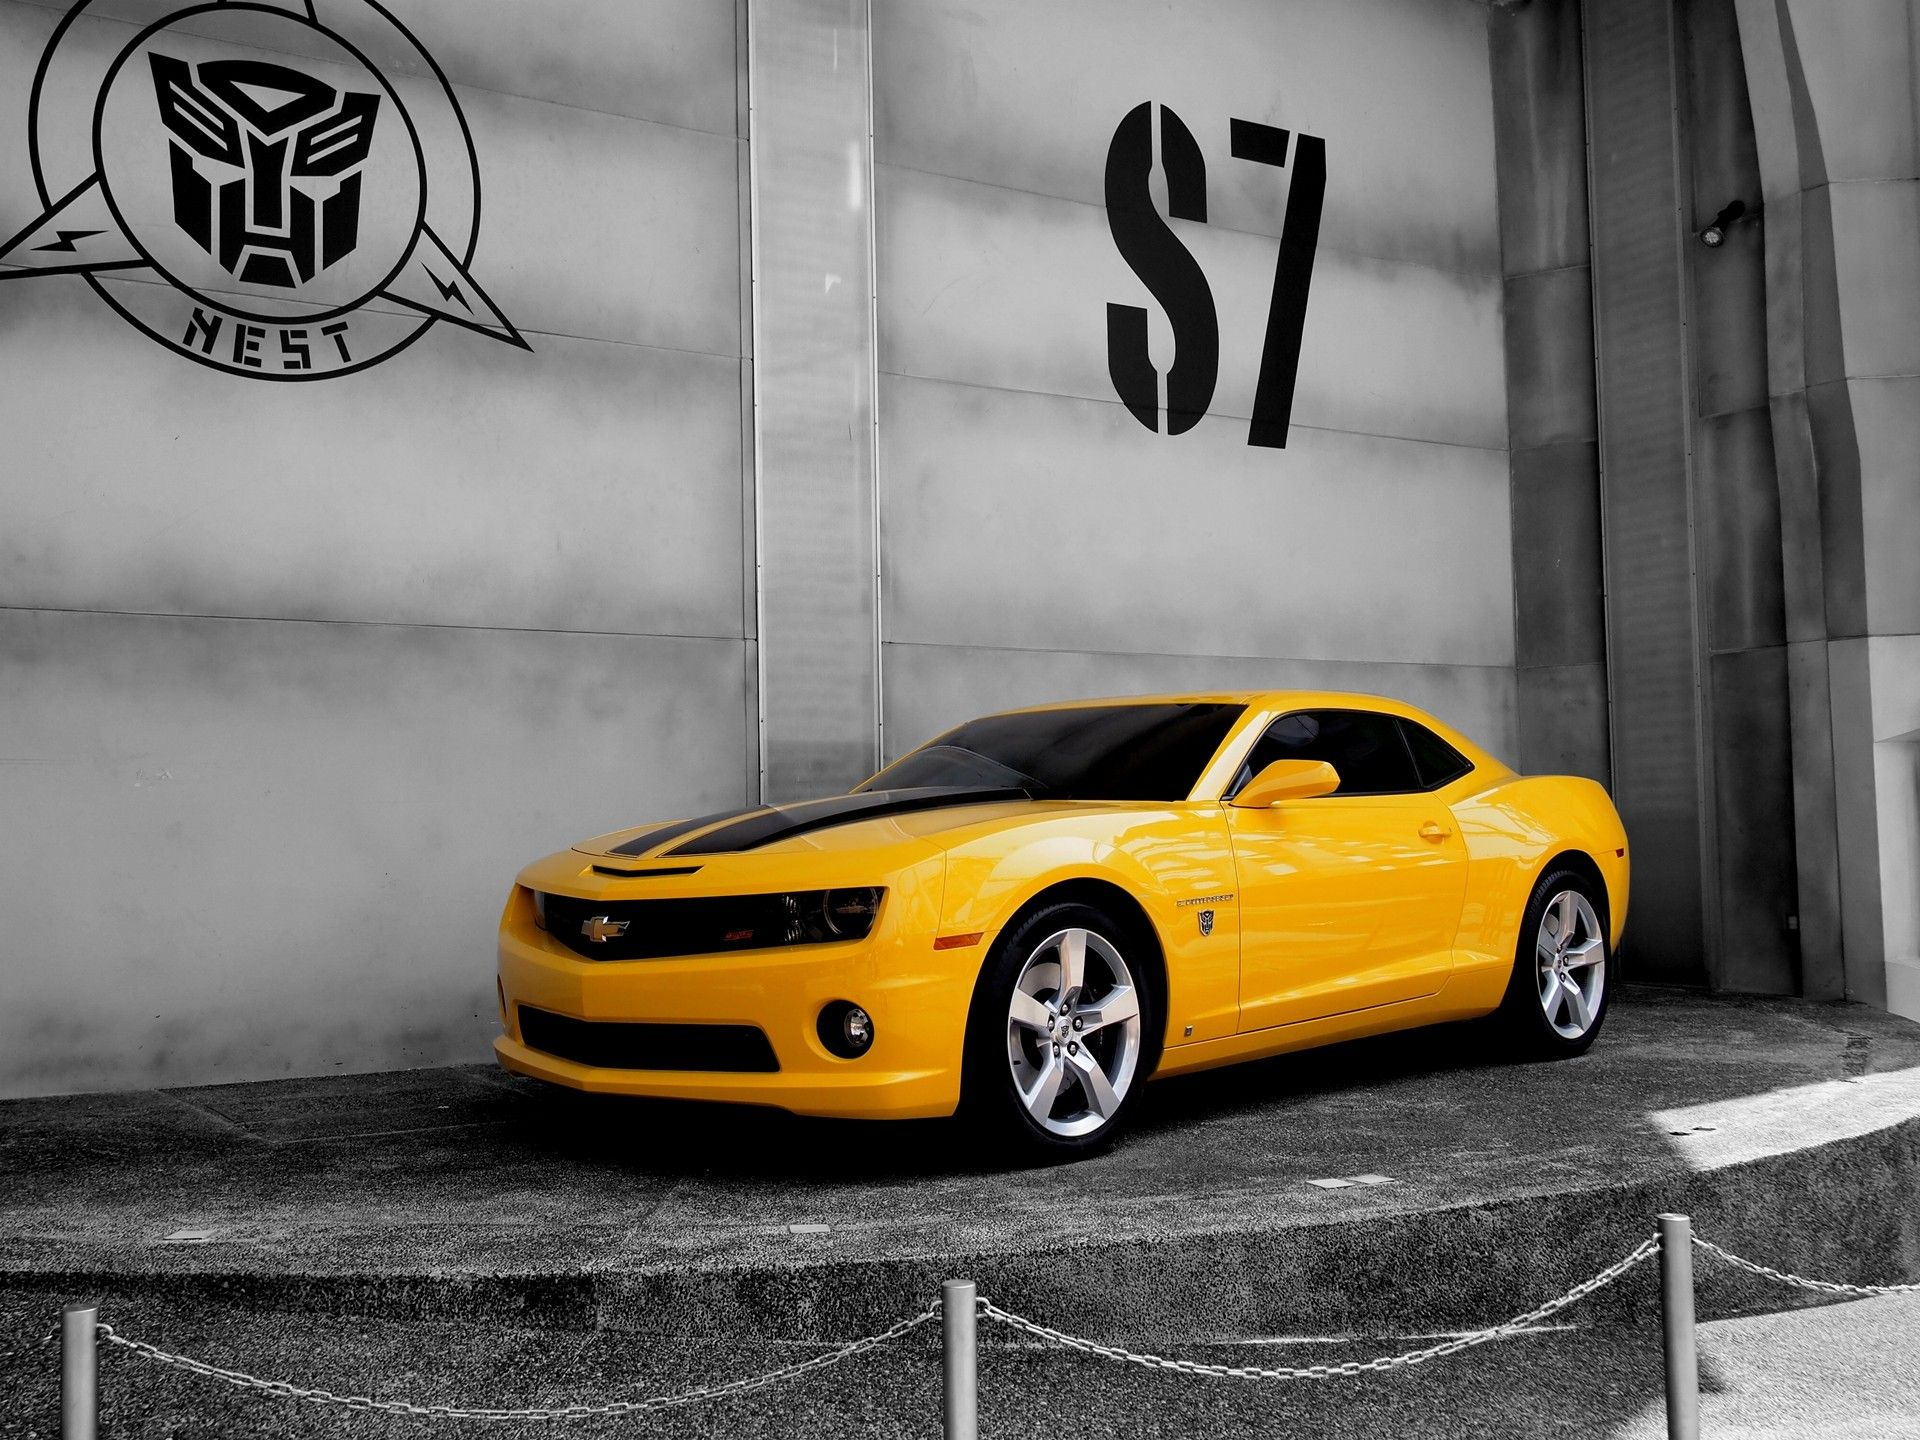 Transformers Bumblebee Car Wallpapers Hd 1080p Camaro Chevrolet Camaro Car